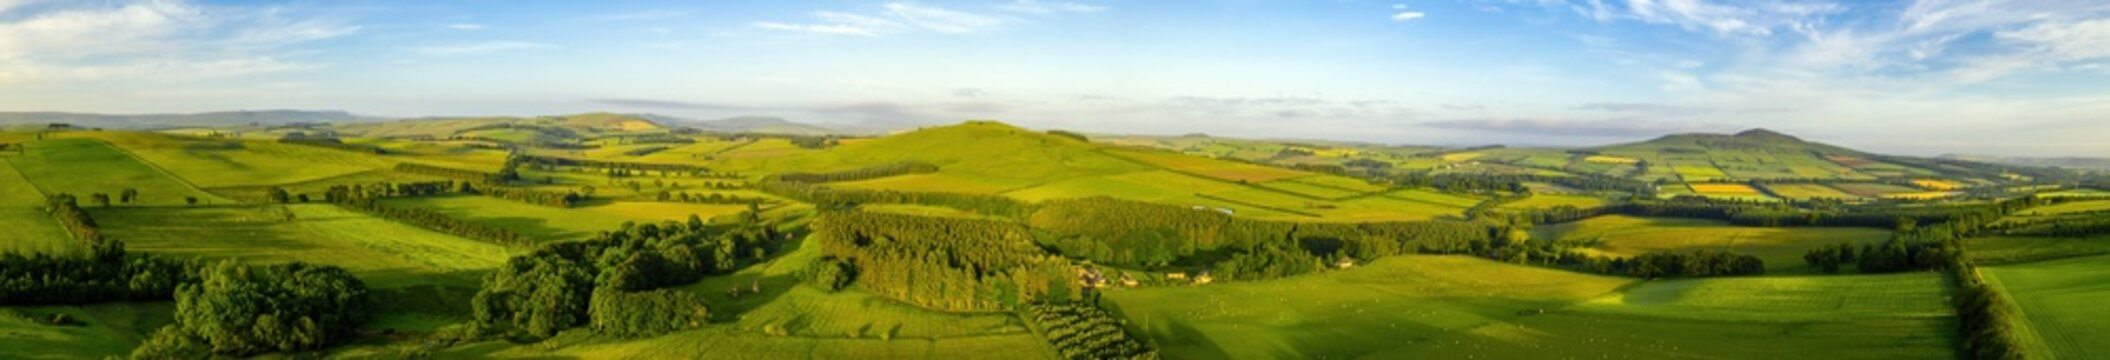 Aerial panorama of a Scottish Borders skyline